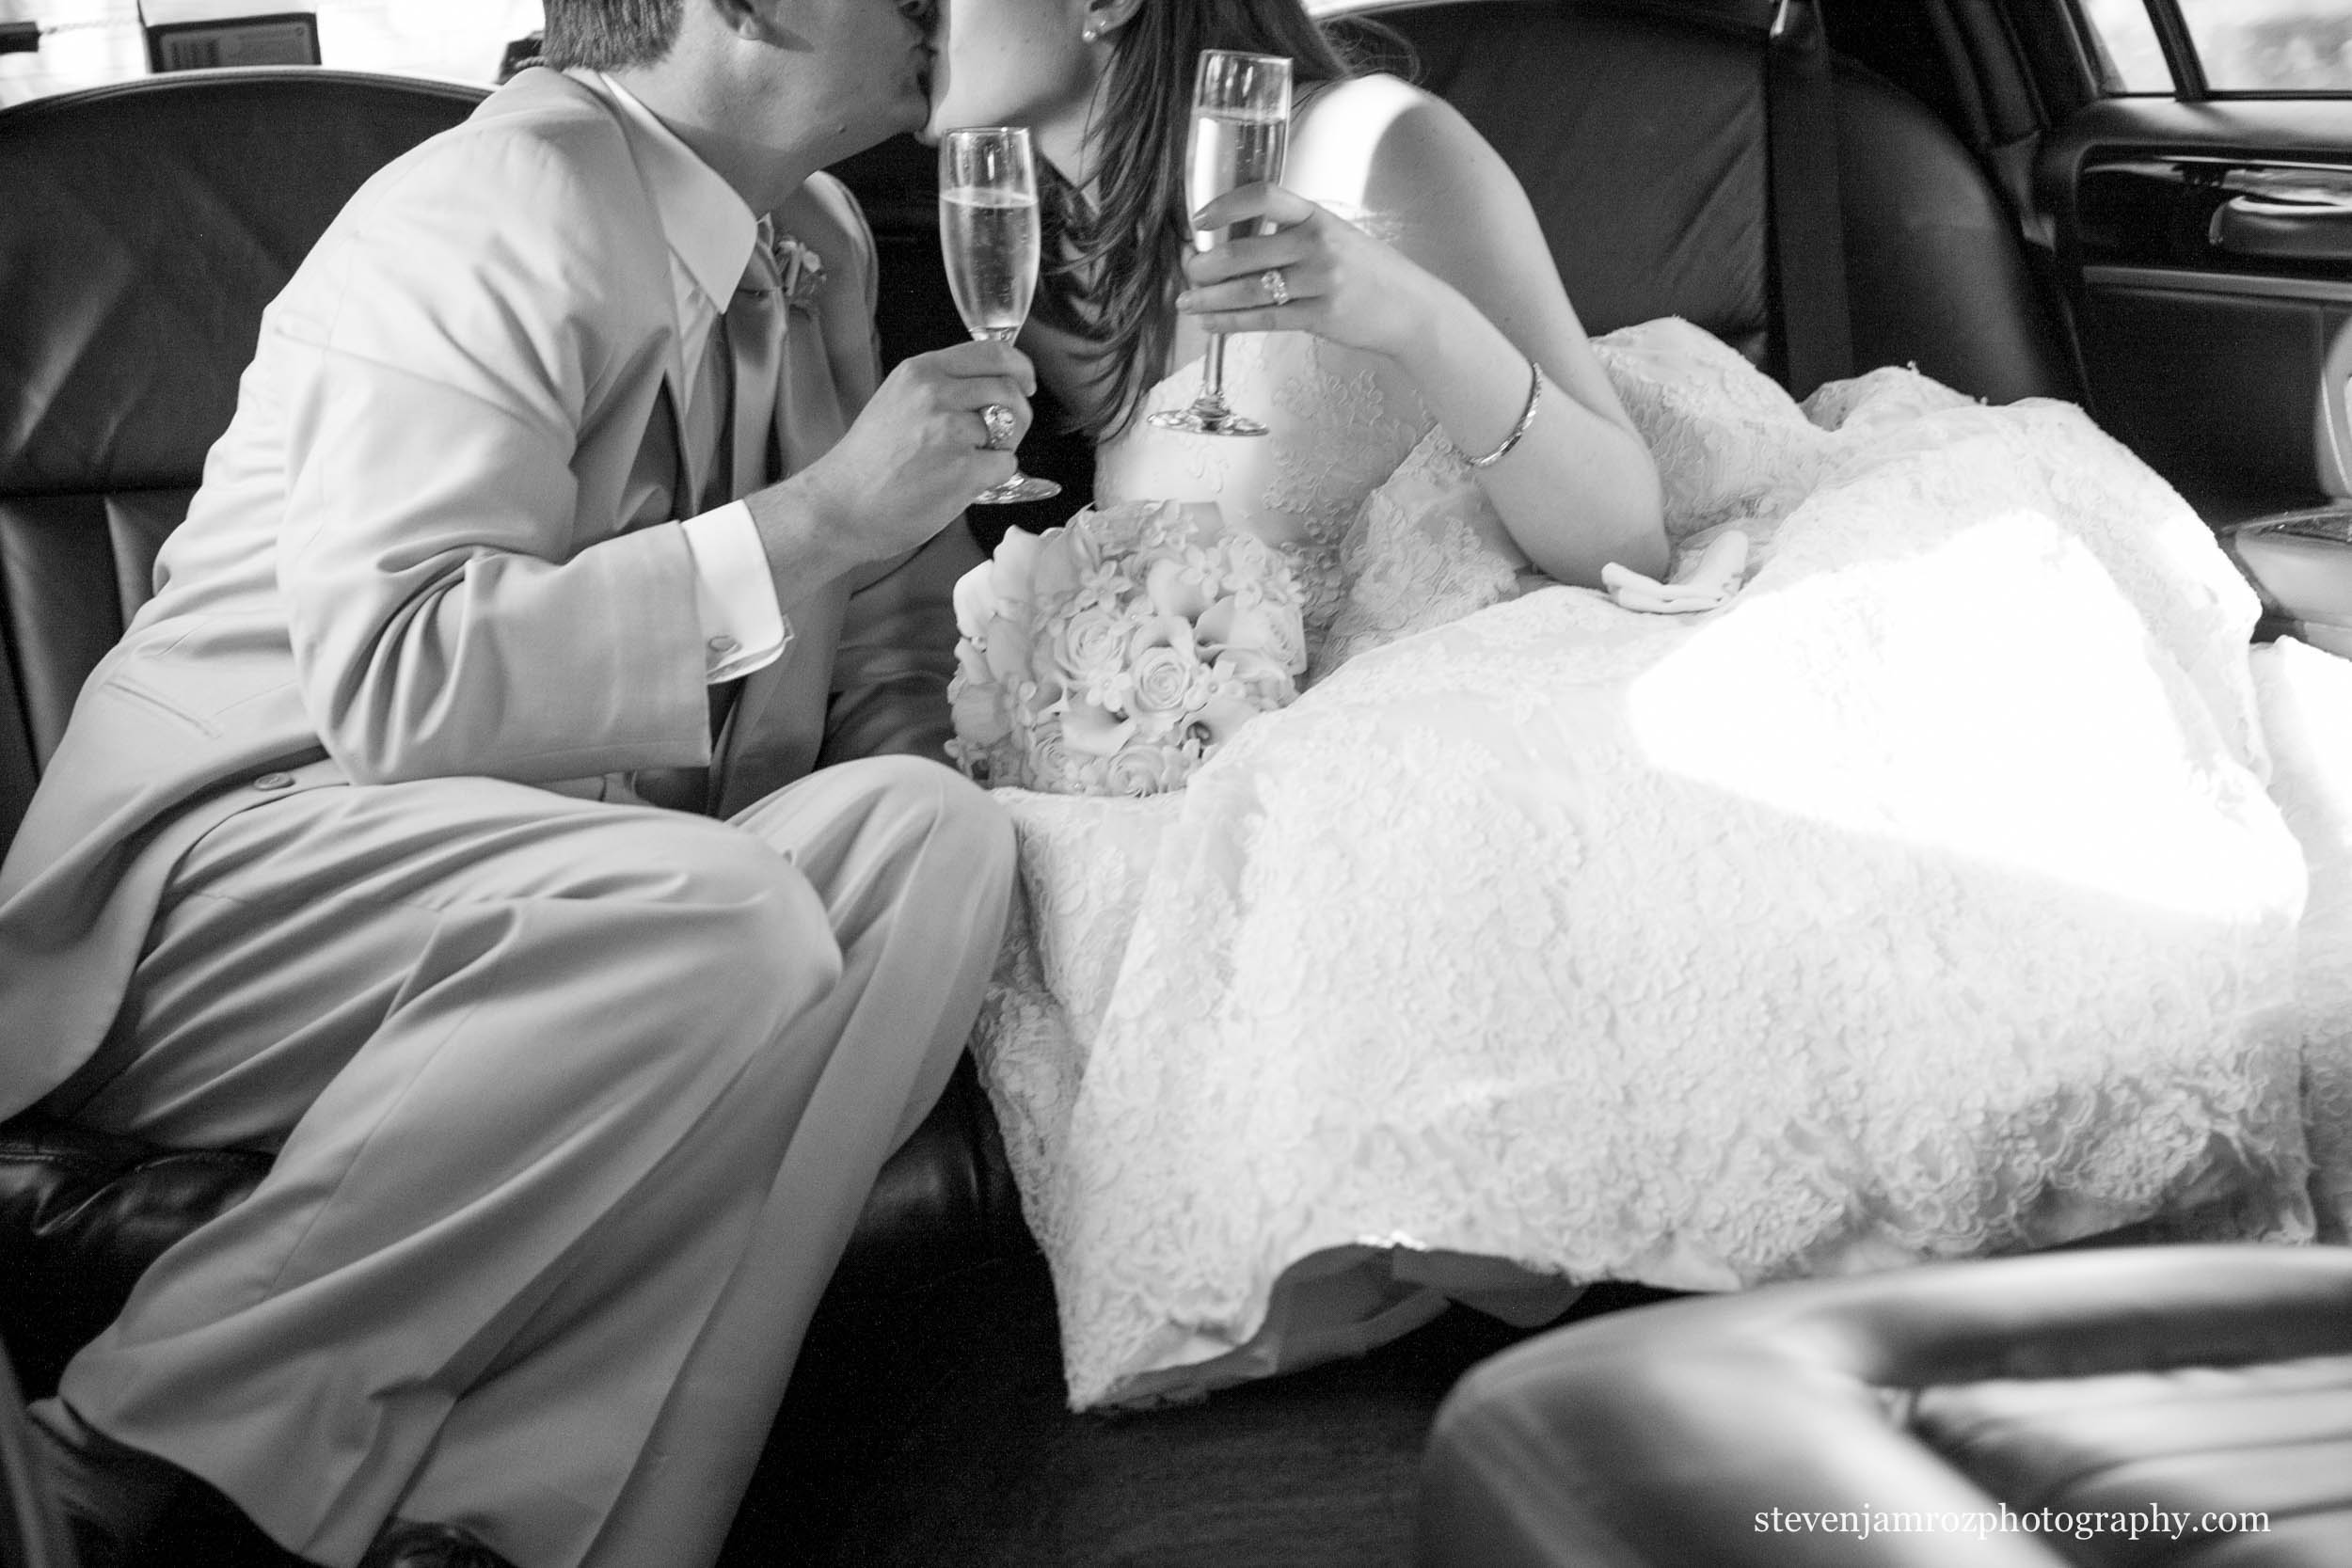 champagne-bride-groom-limo-raleigh-steven-jamroz-0720.jpg